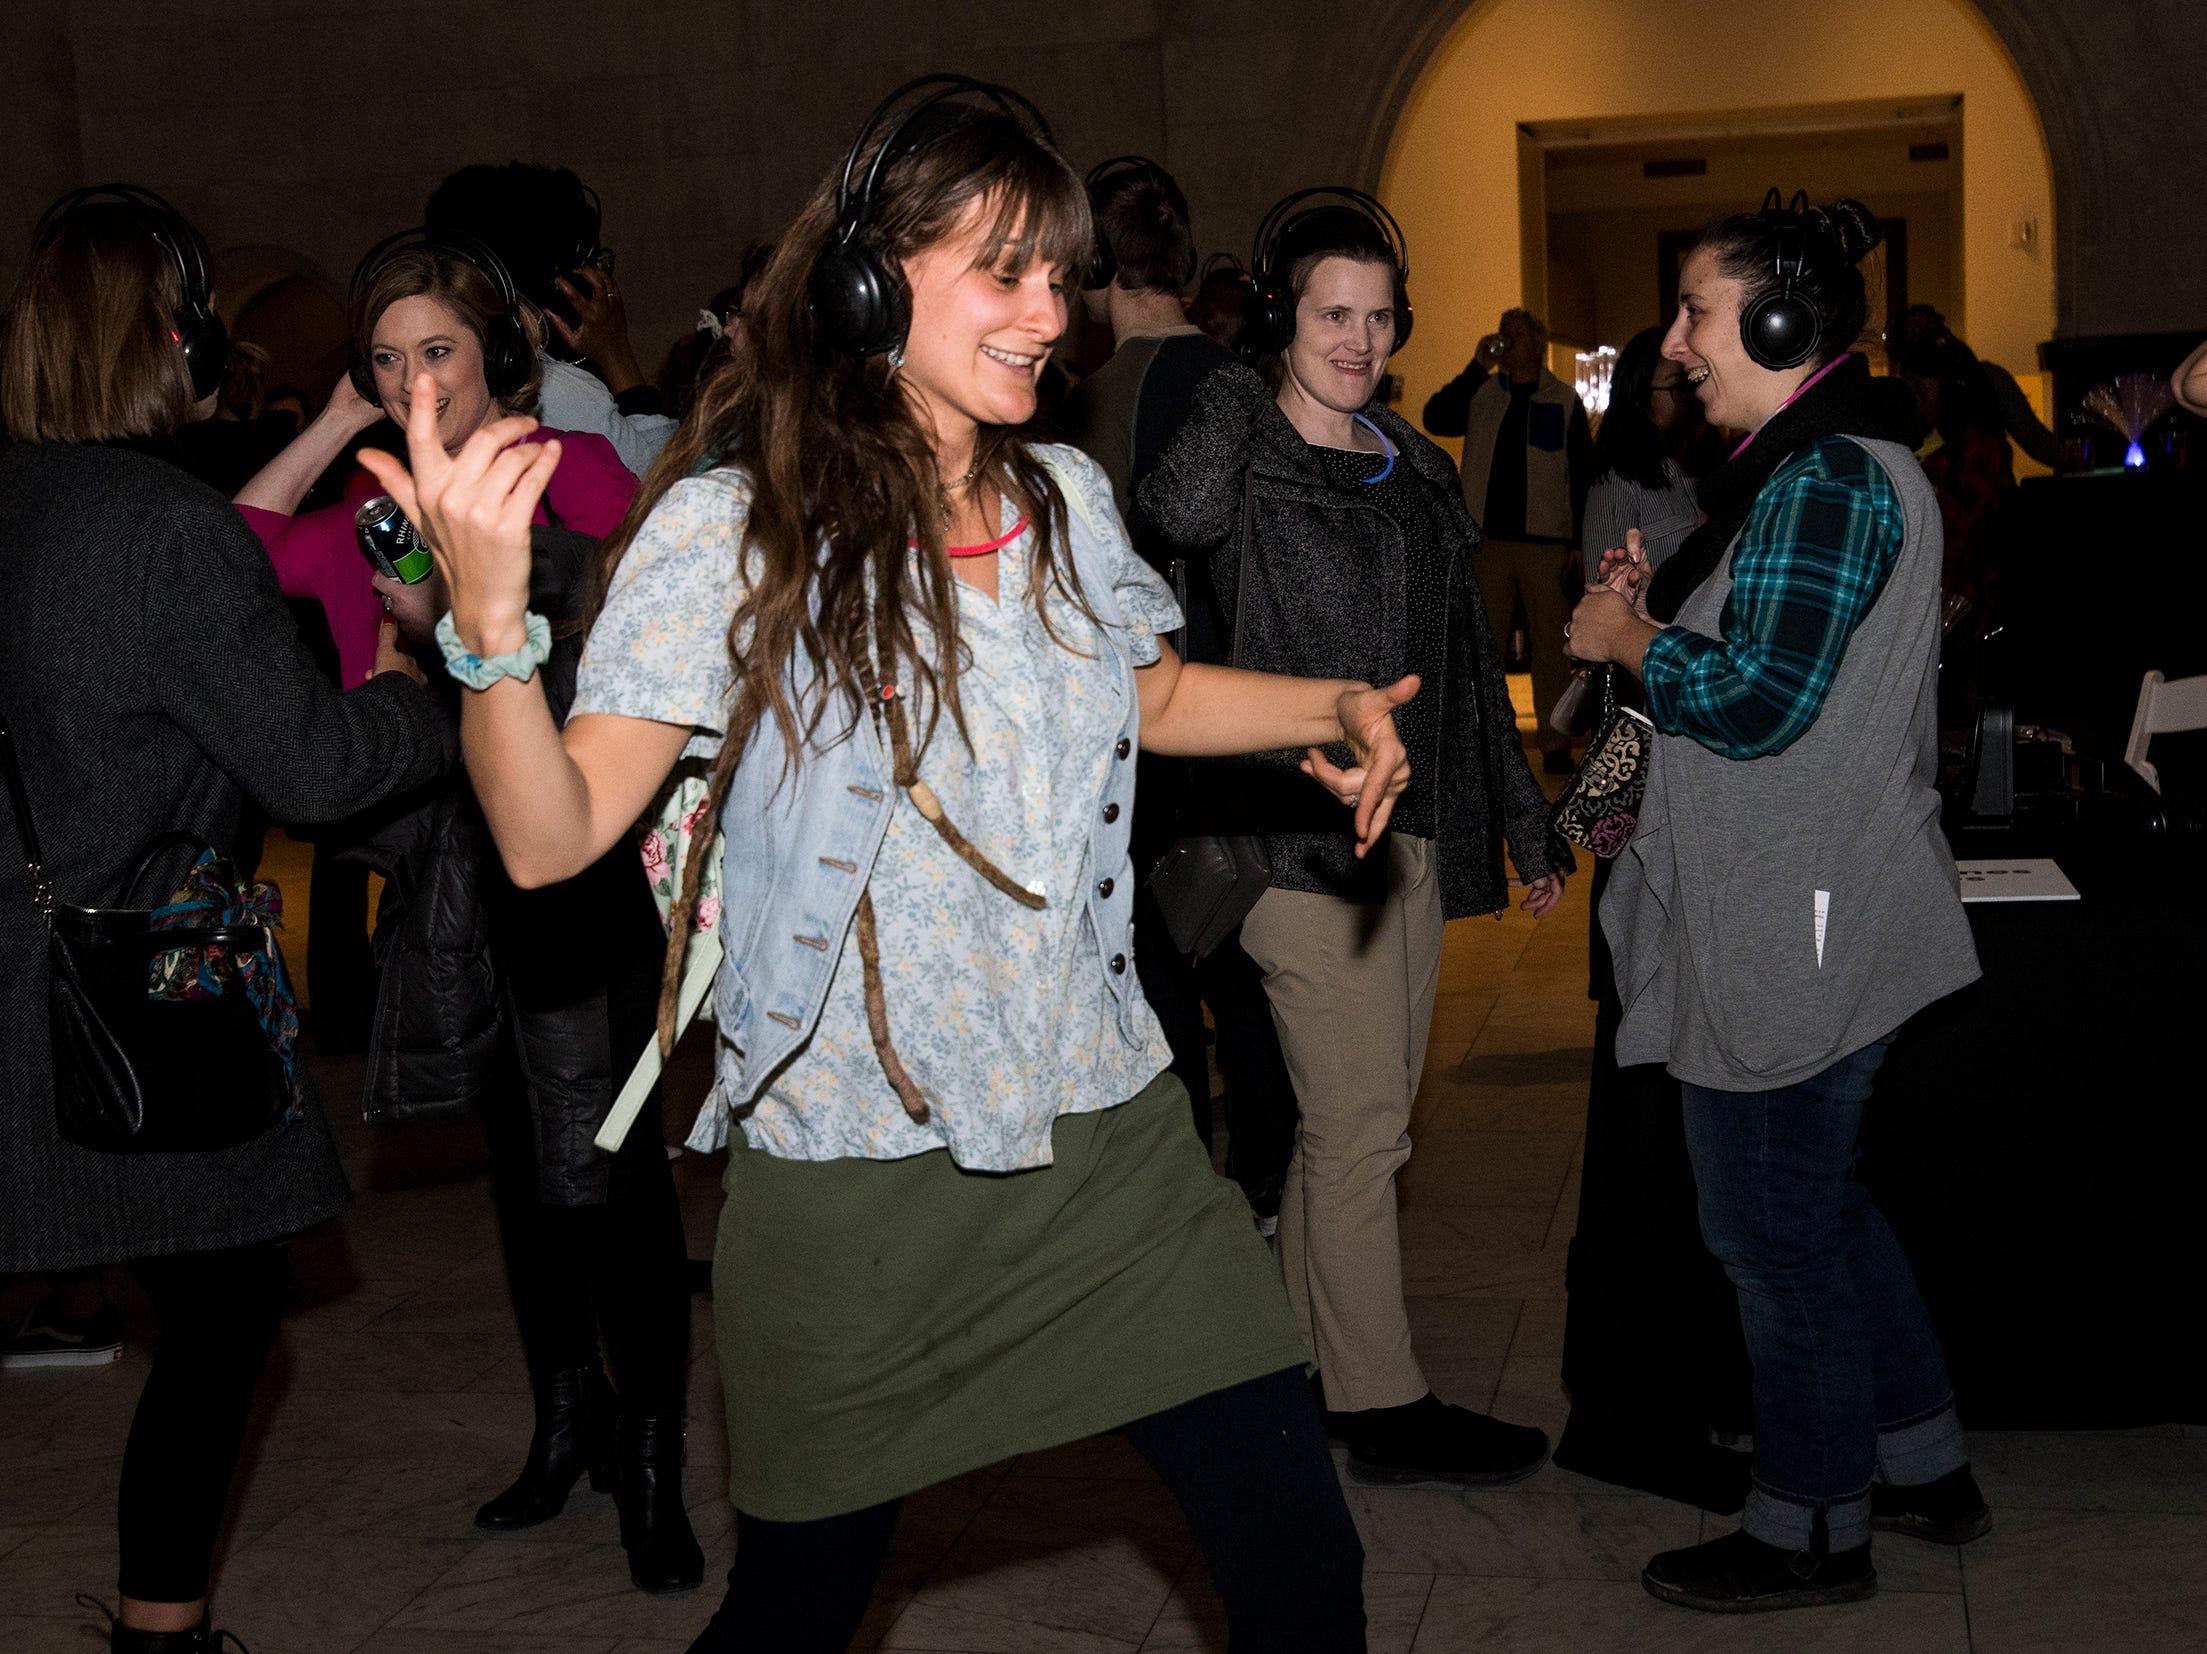 Nichole Mix dances during a 90s-themed silent disco at Art After Dark at the Cincinnati Art Museum Friday, January 25, 2019 in Cincinnati, Ohio.